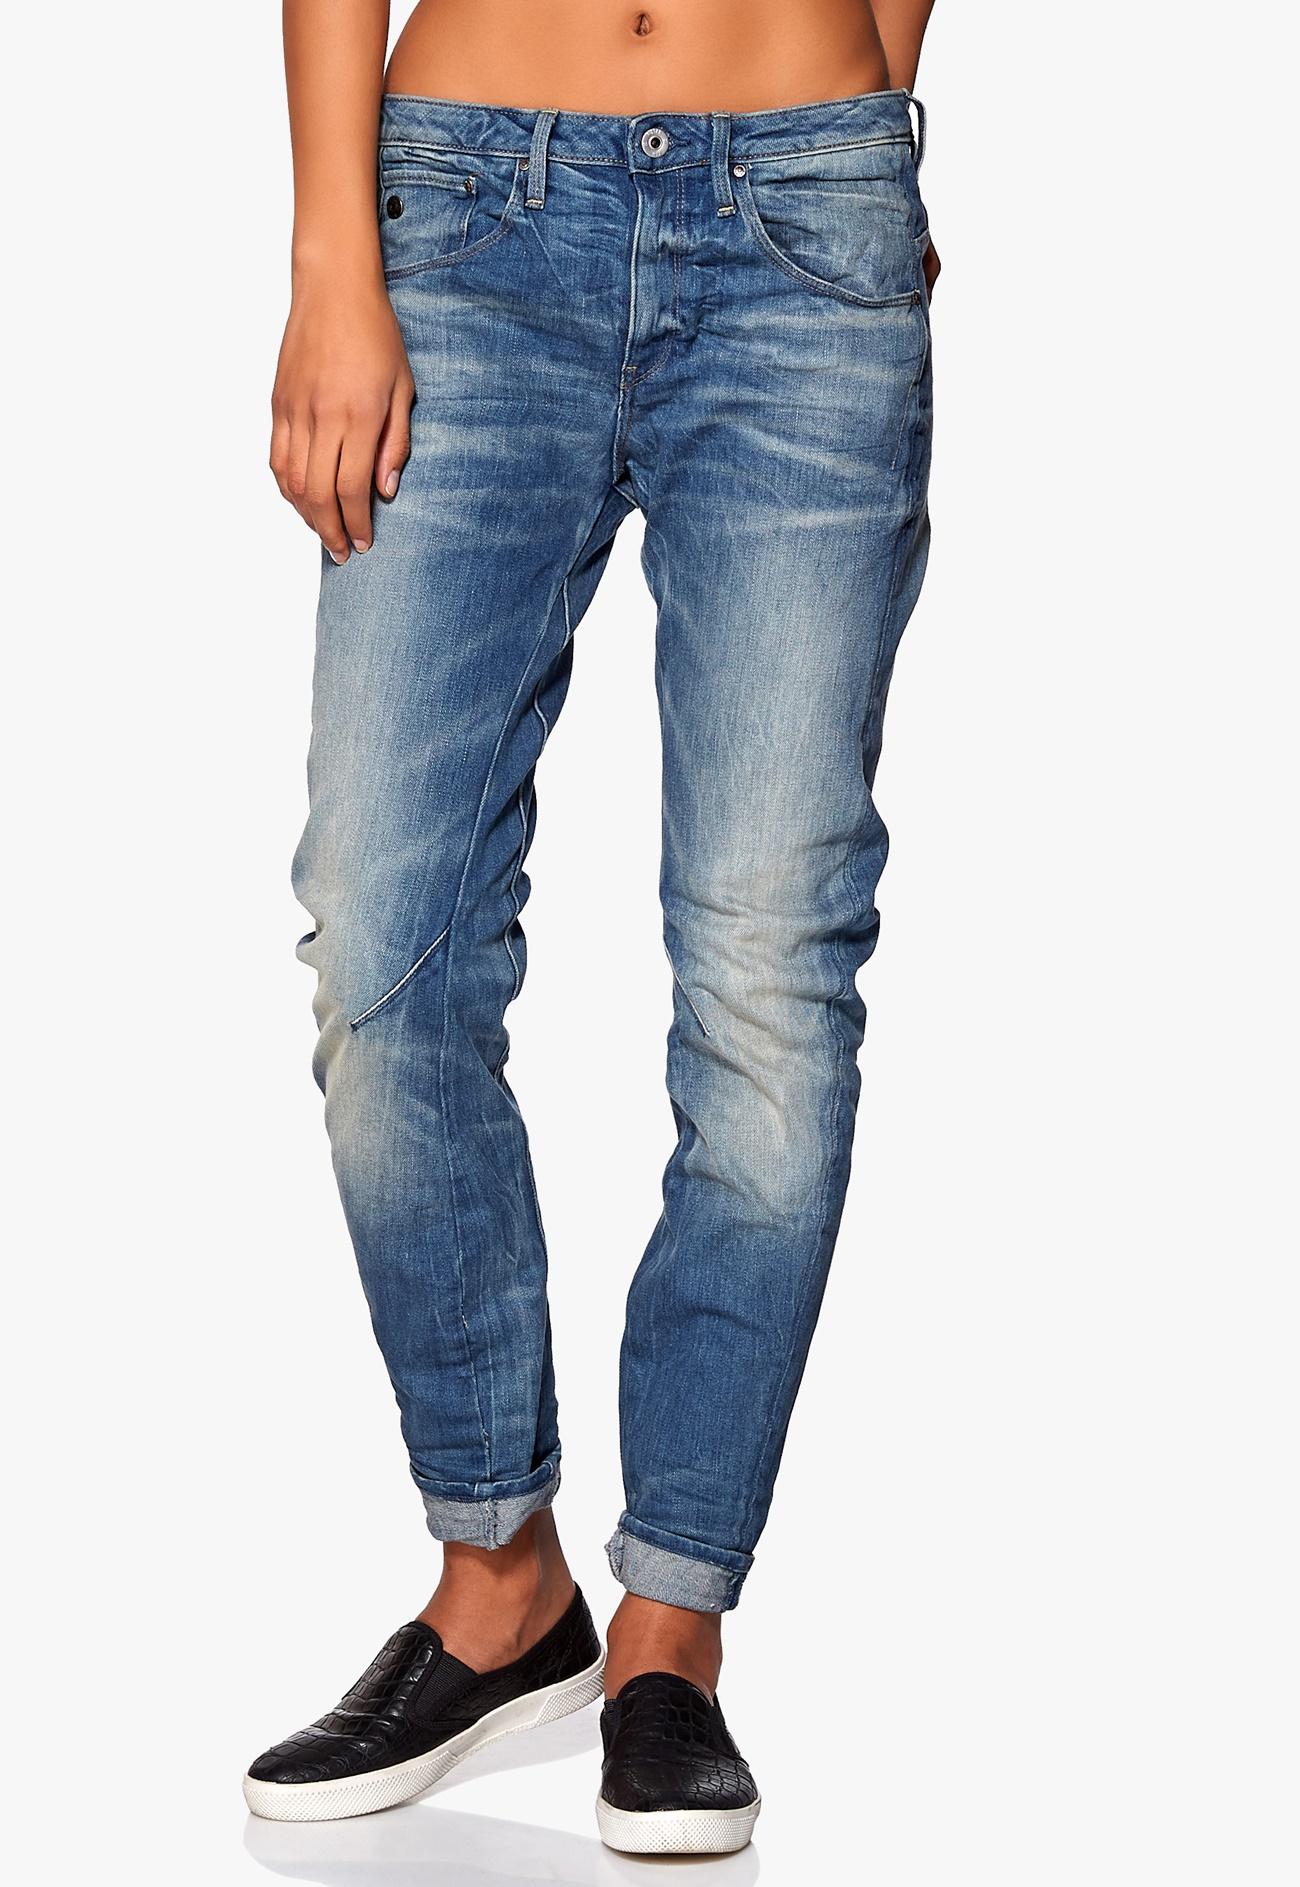 g star arc 3d boyfriend jeans 424 lt aged bubbleroom. Black Bedroom Furniture Sets. Home Design Ideas